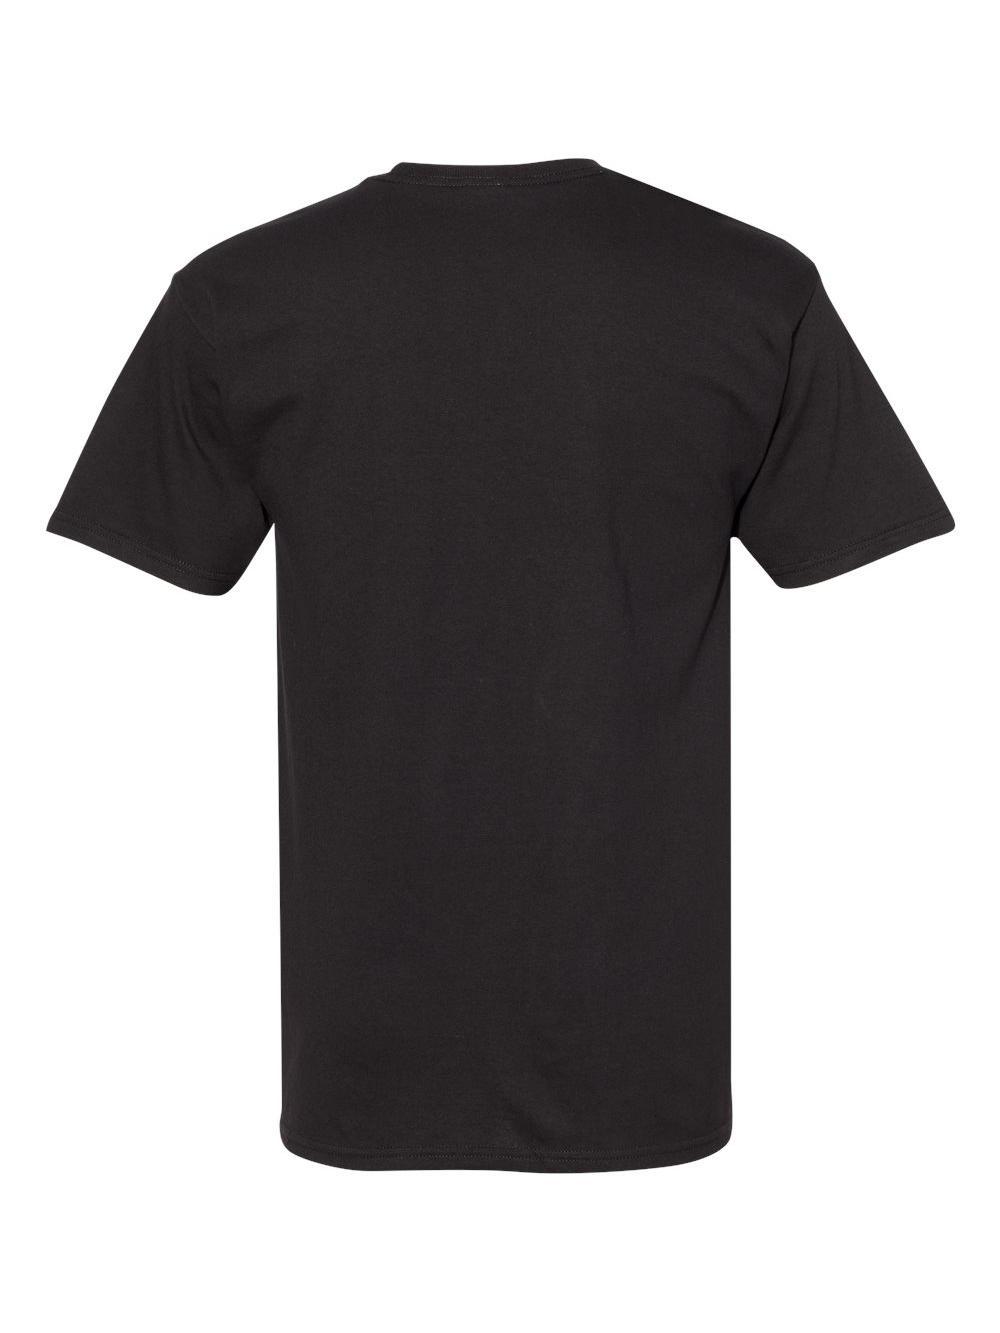 ALSTYLE-Premium-T-Shirt-1701 thumbnail 10